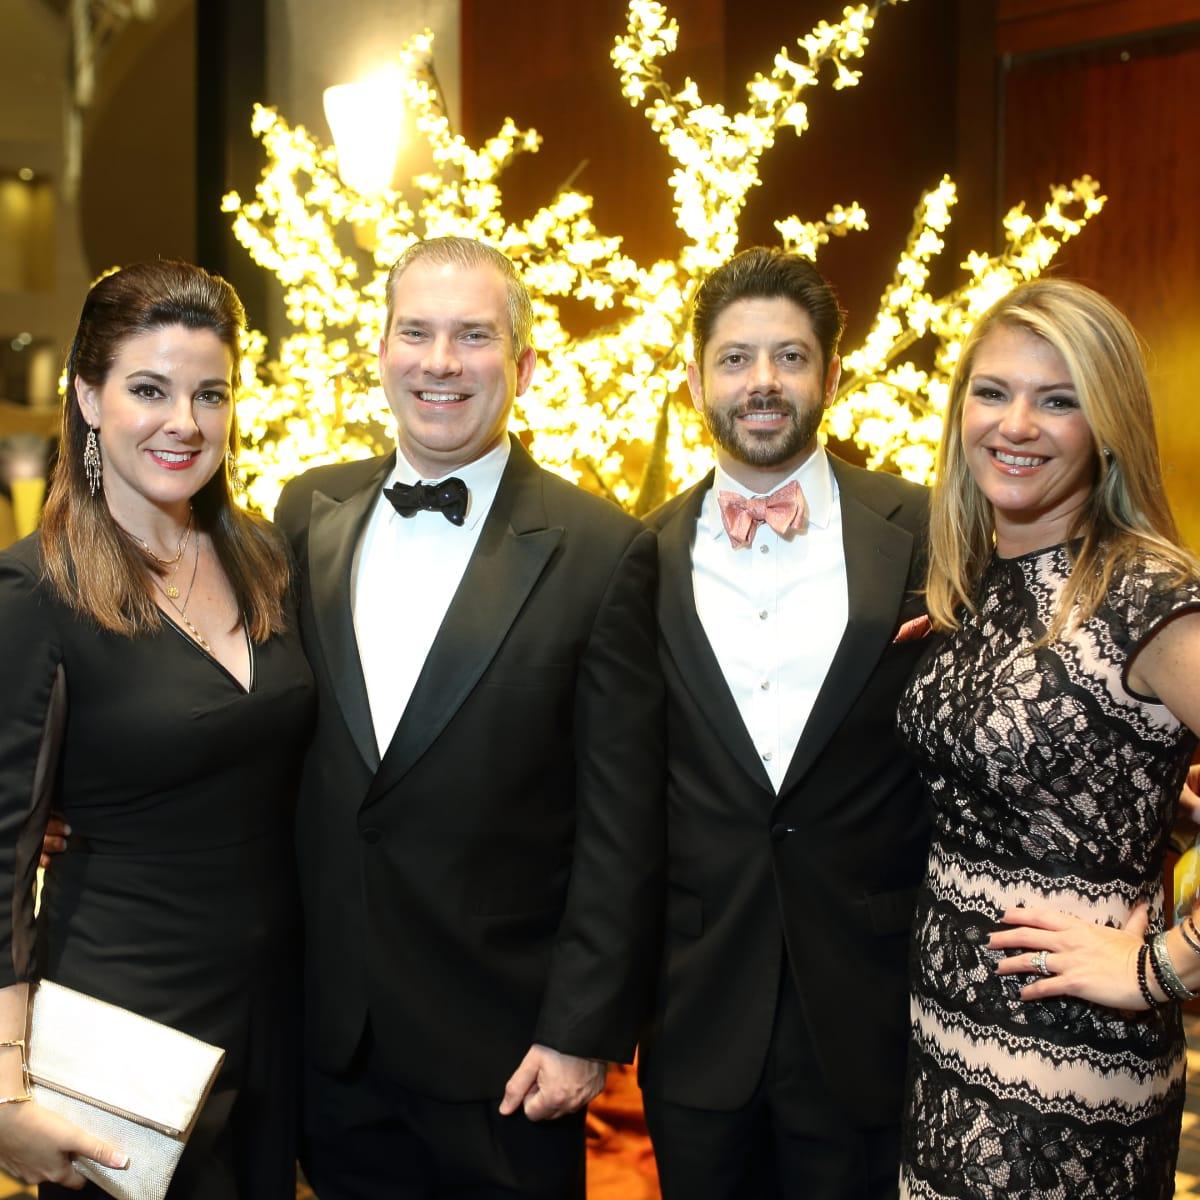 News, Shelby, Women's Home gala, Nov. 2015,  Elaine and Jim Turner, Brendan and Jenna Gilbert